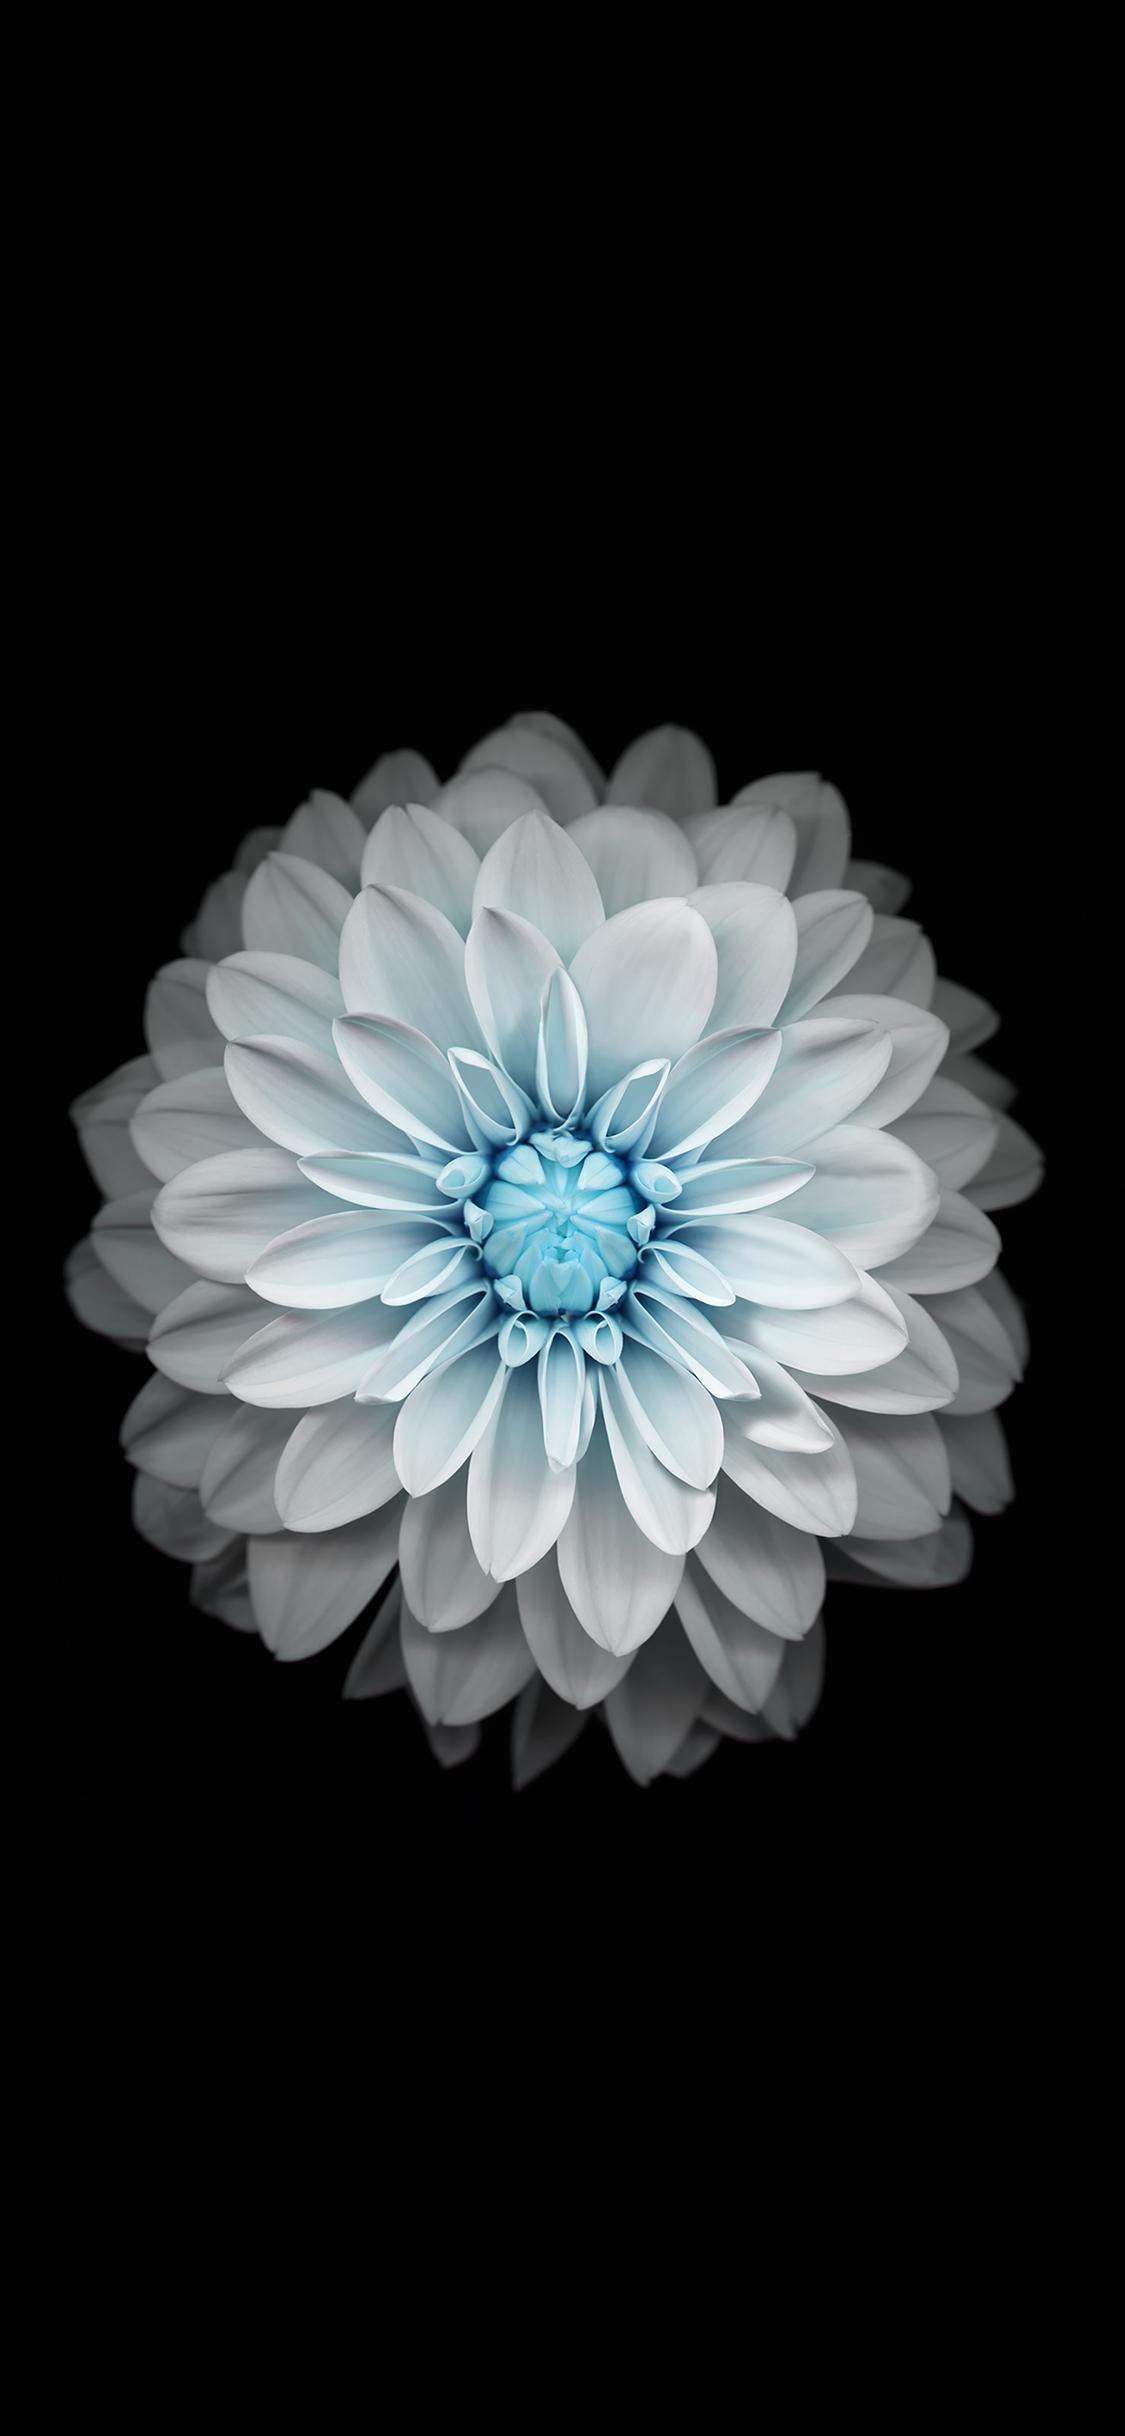 iPhoneXpapers.com-Apple-iPhone-wallpaper-ac92-wallpaper-apple-iphone6-plus-ios8-flower-blue